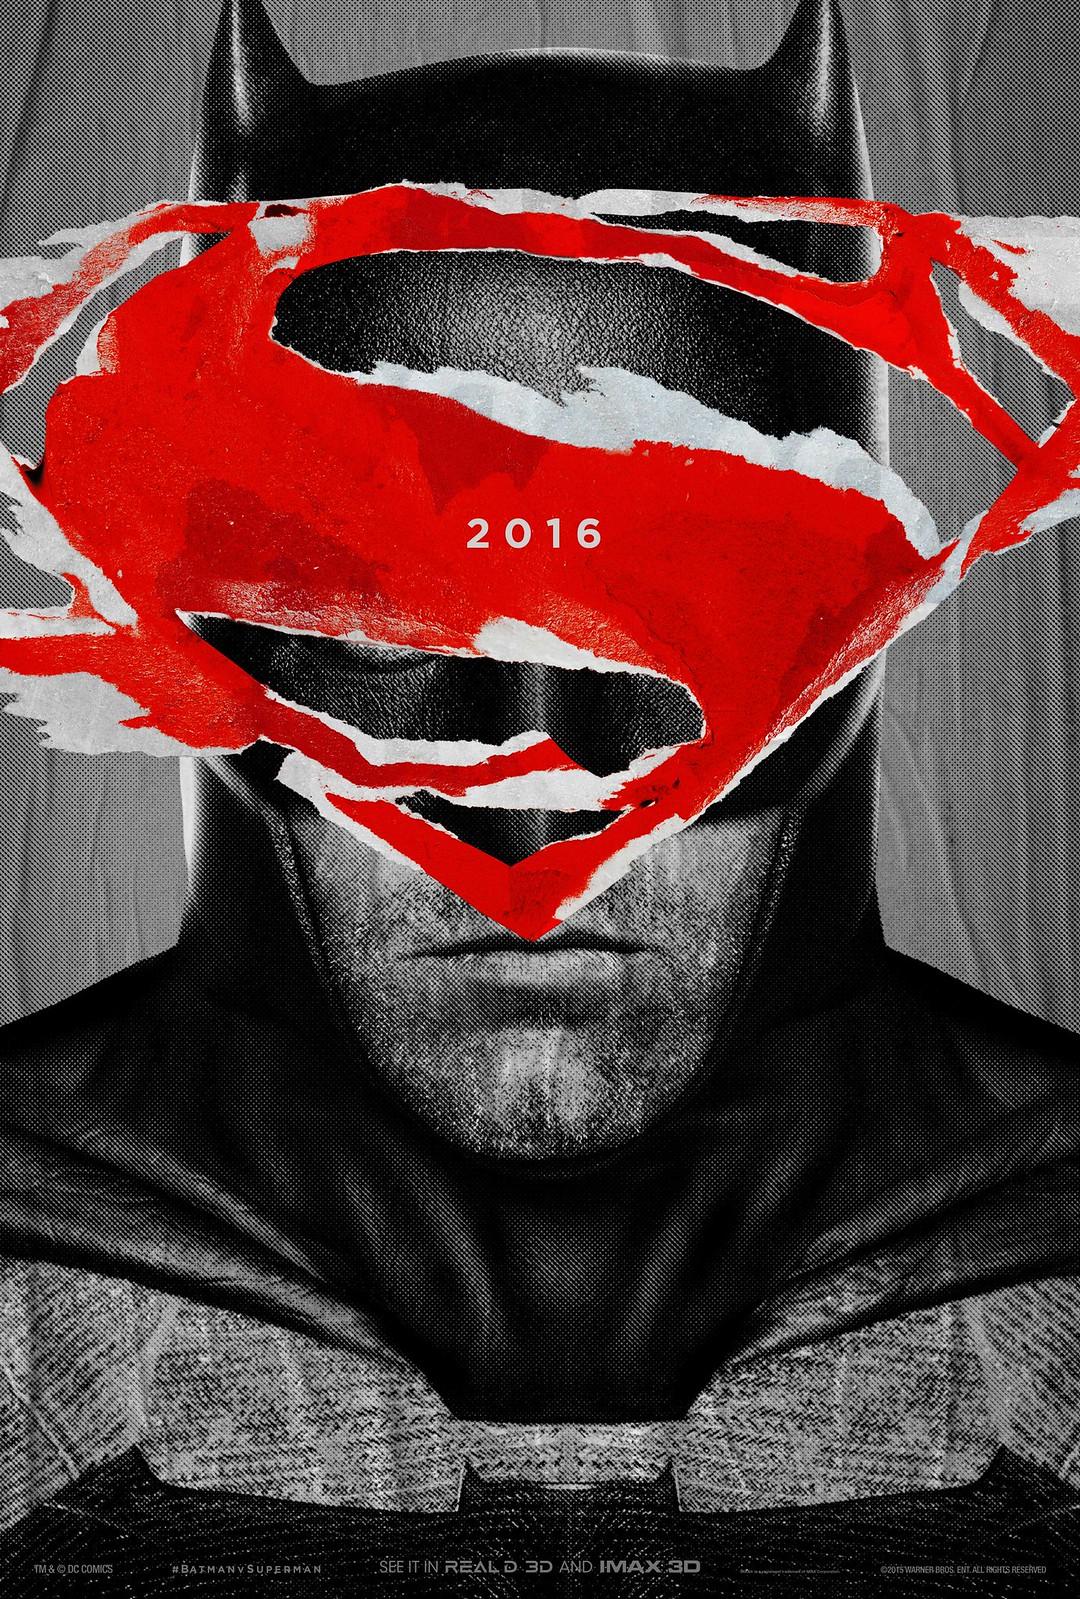 Batman v Superman: Dawn of Justice Photos Released 23